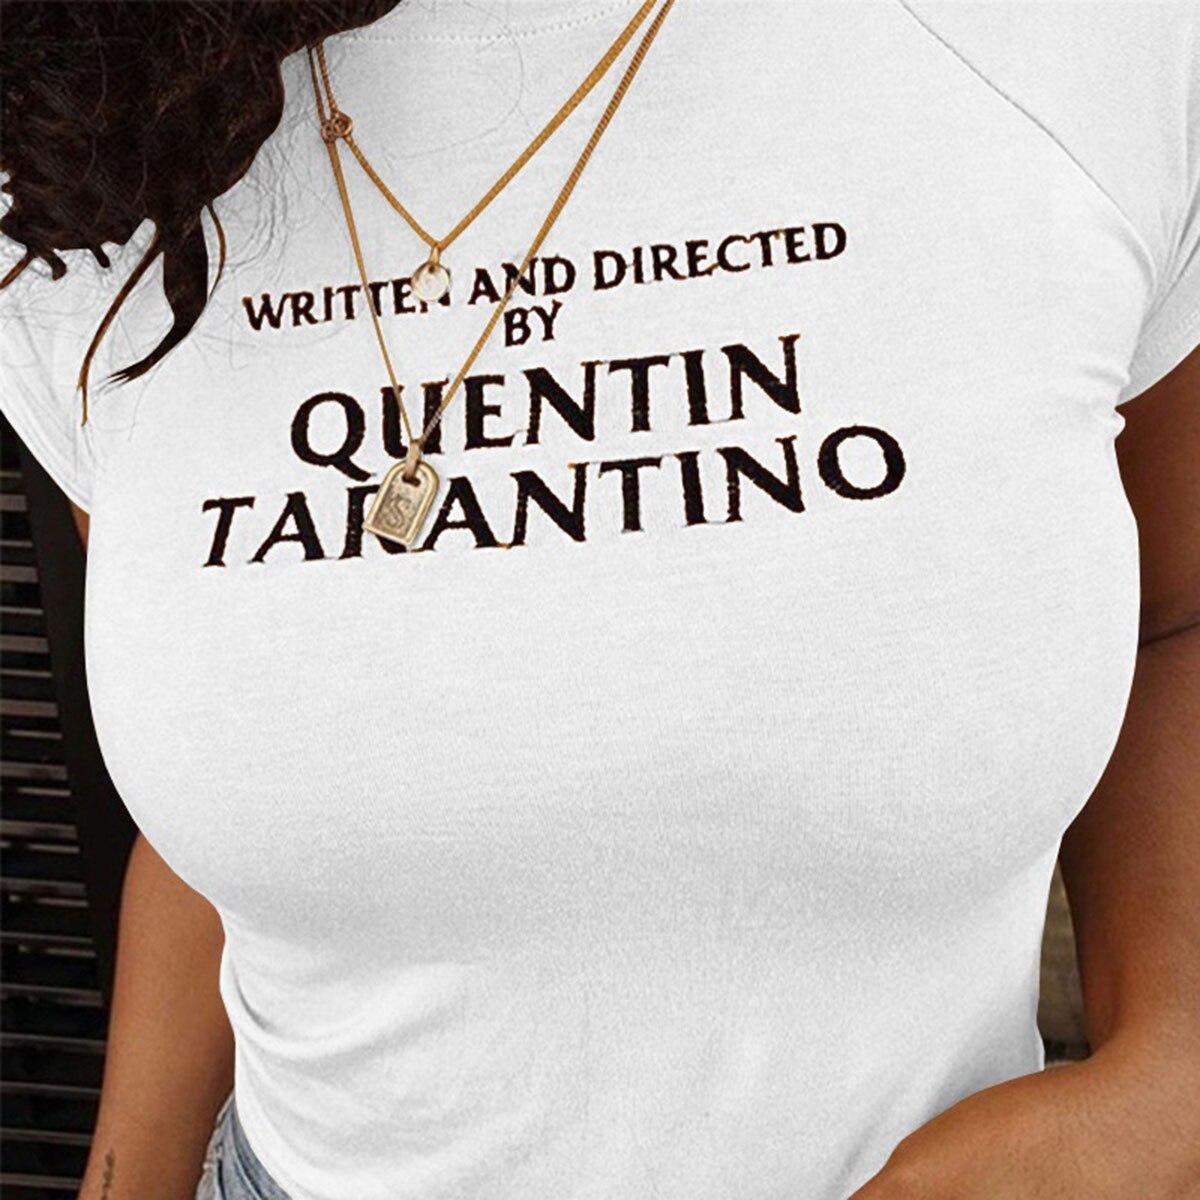 sexy-crop-tops-women-side-stripe-short-sleeve-2018-fashion-quentin-font-b-tarantino-b-font-cotton-yellow-goth-art-slogan-90s-tees-tshirt-lady